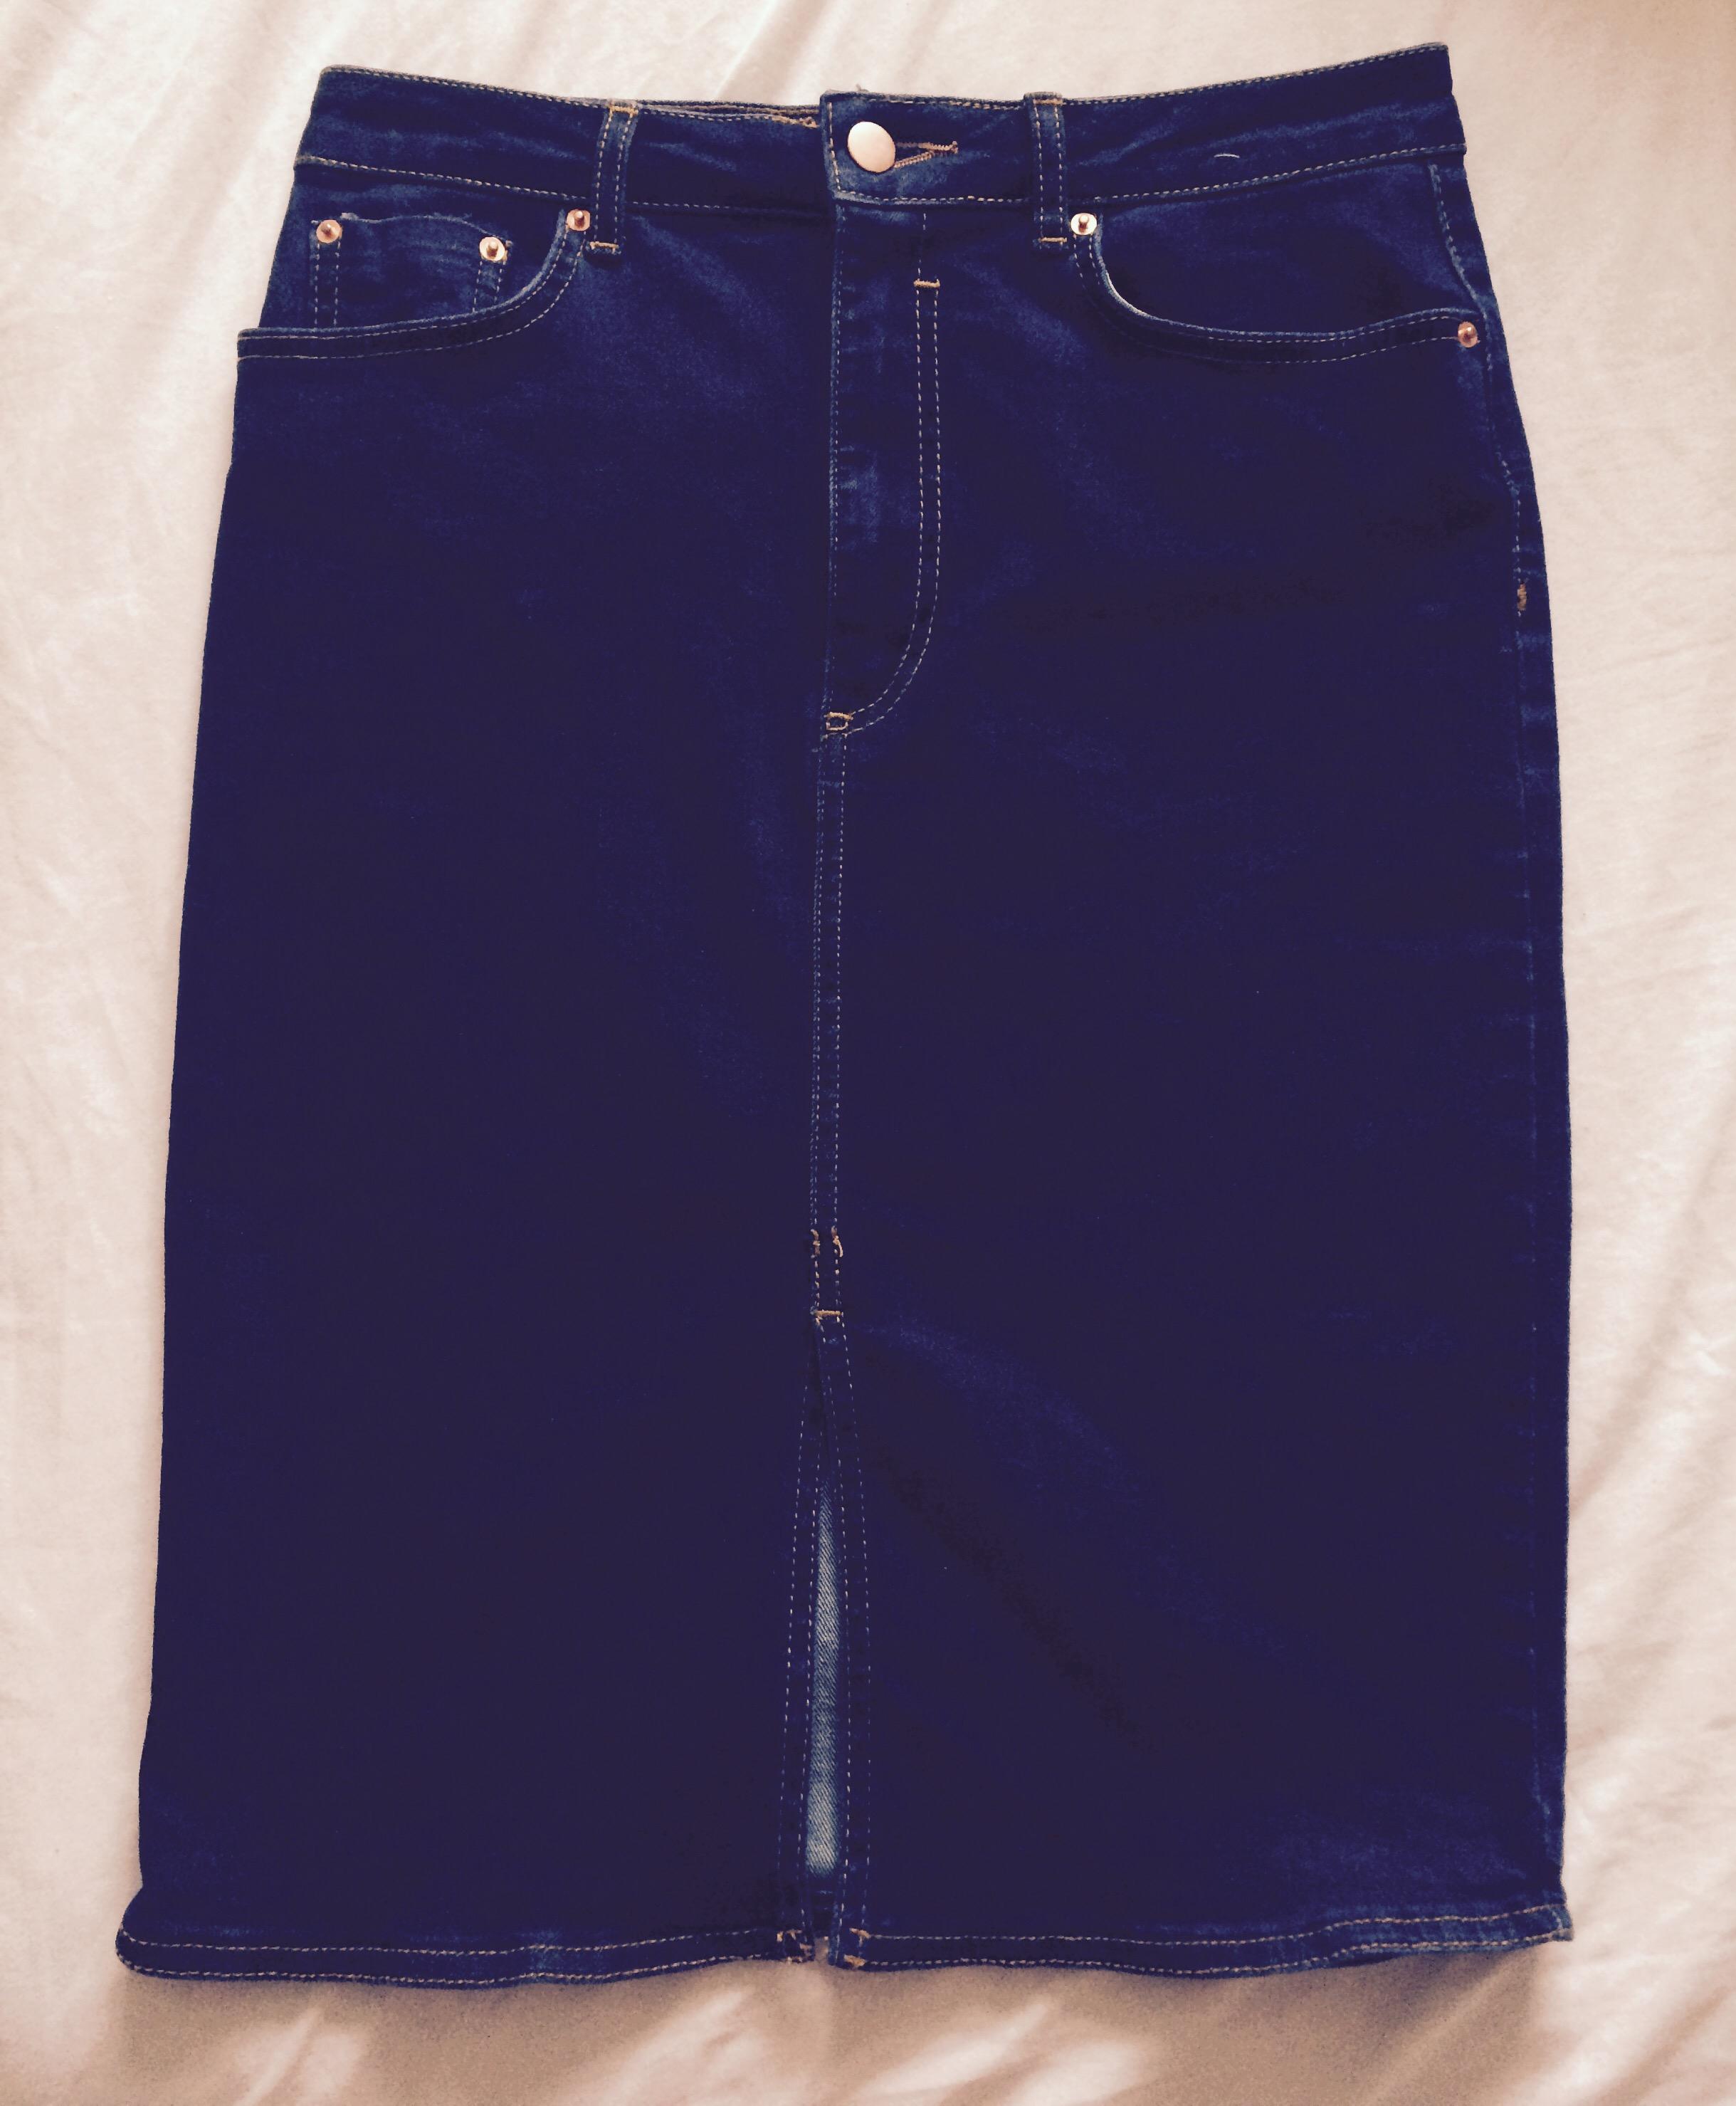 Friday Fashion – The Denim Skirt